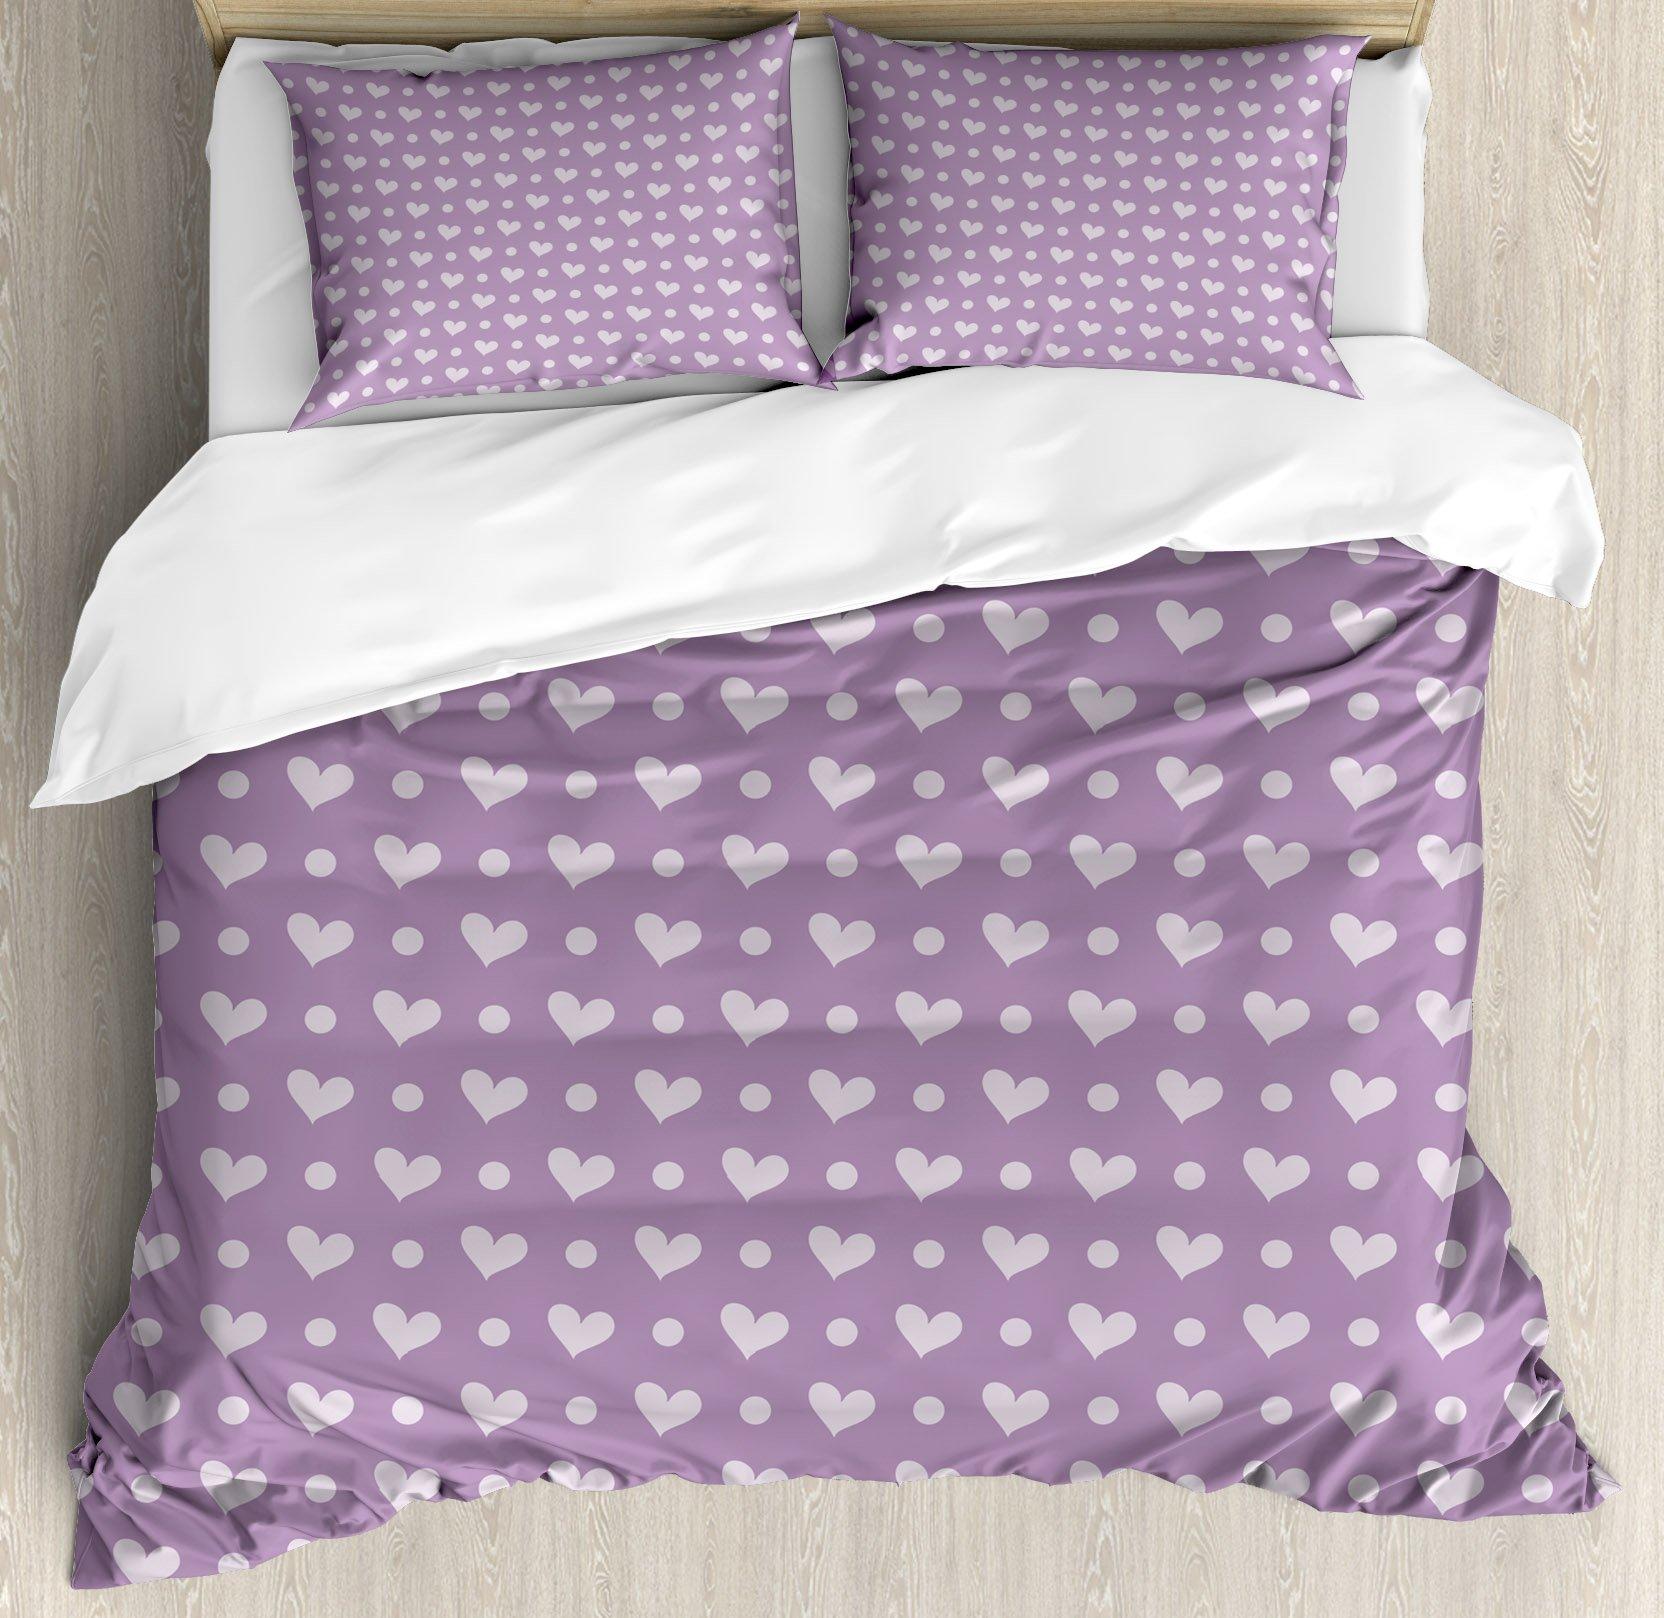 Ambesonne Purple Duvet Cover Set King Size, Love Valentine's Day Couple Wedding Bride Inspiring Heart Icon Design Image, Decorative 3 Piece Bedding Set with 2 Pillow Shams, Lavander and Purple